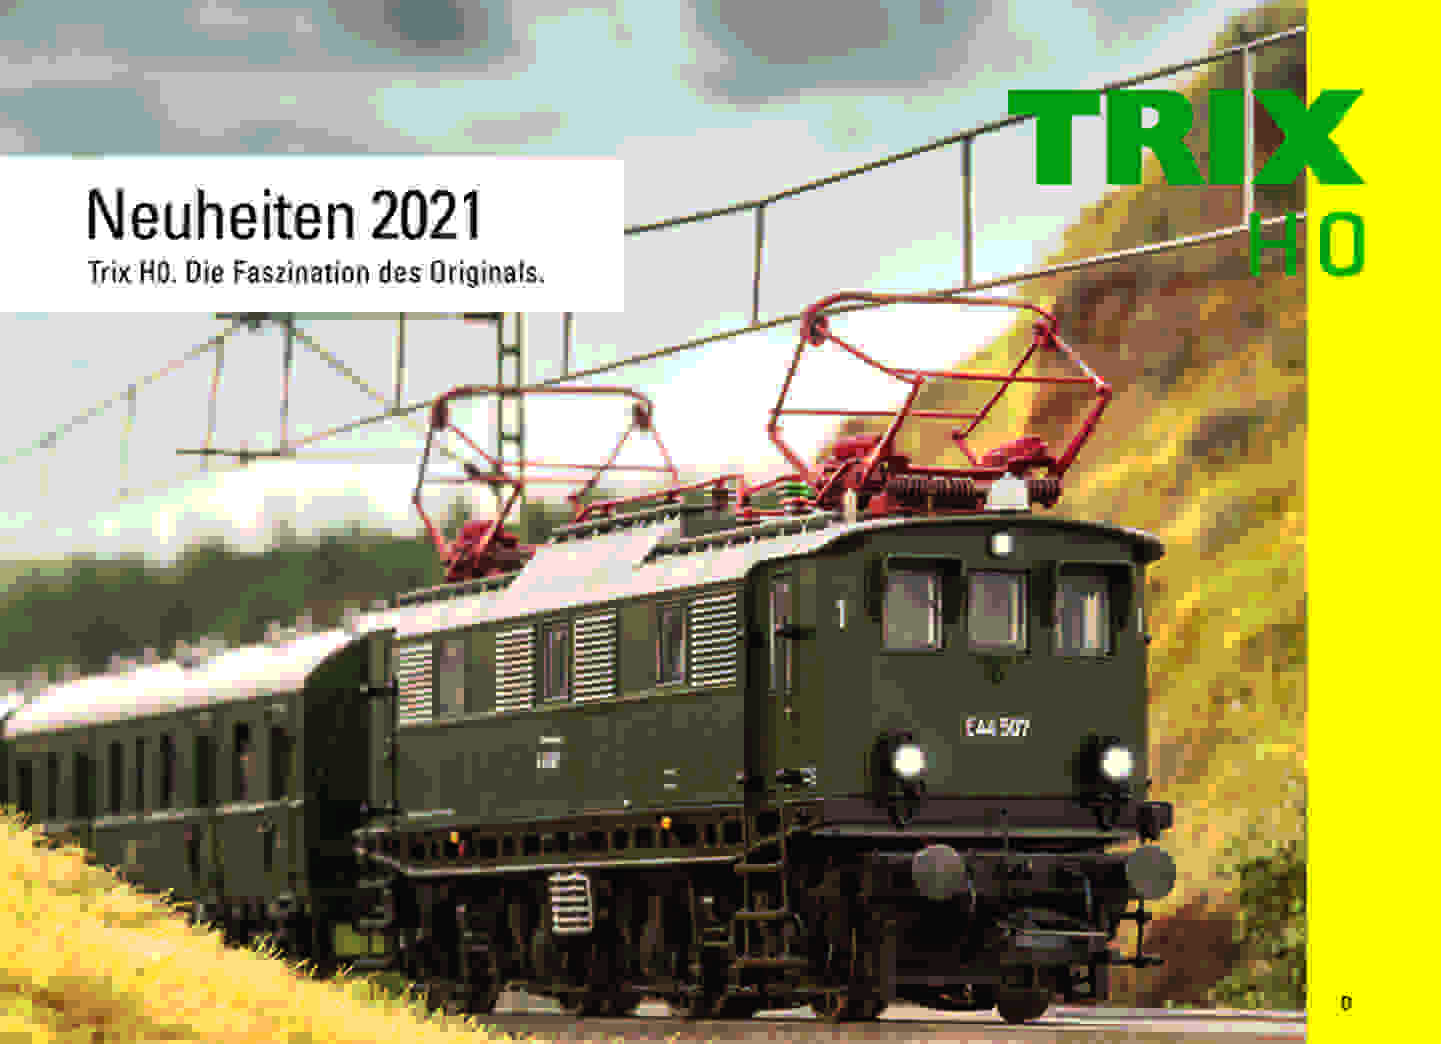 Trix Neuheiten Katalog 2020